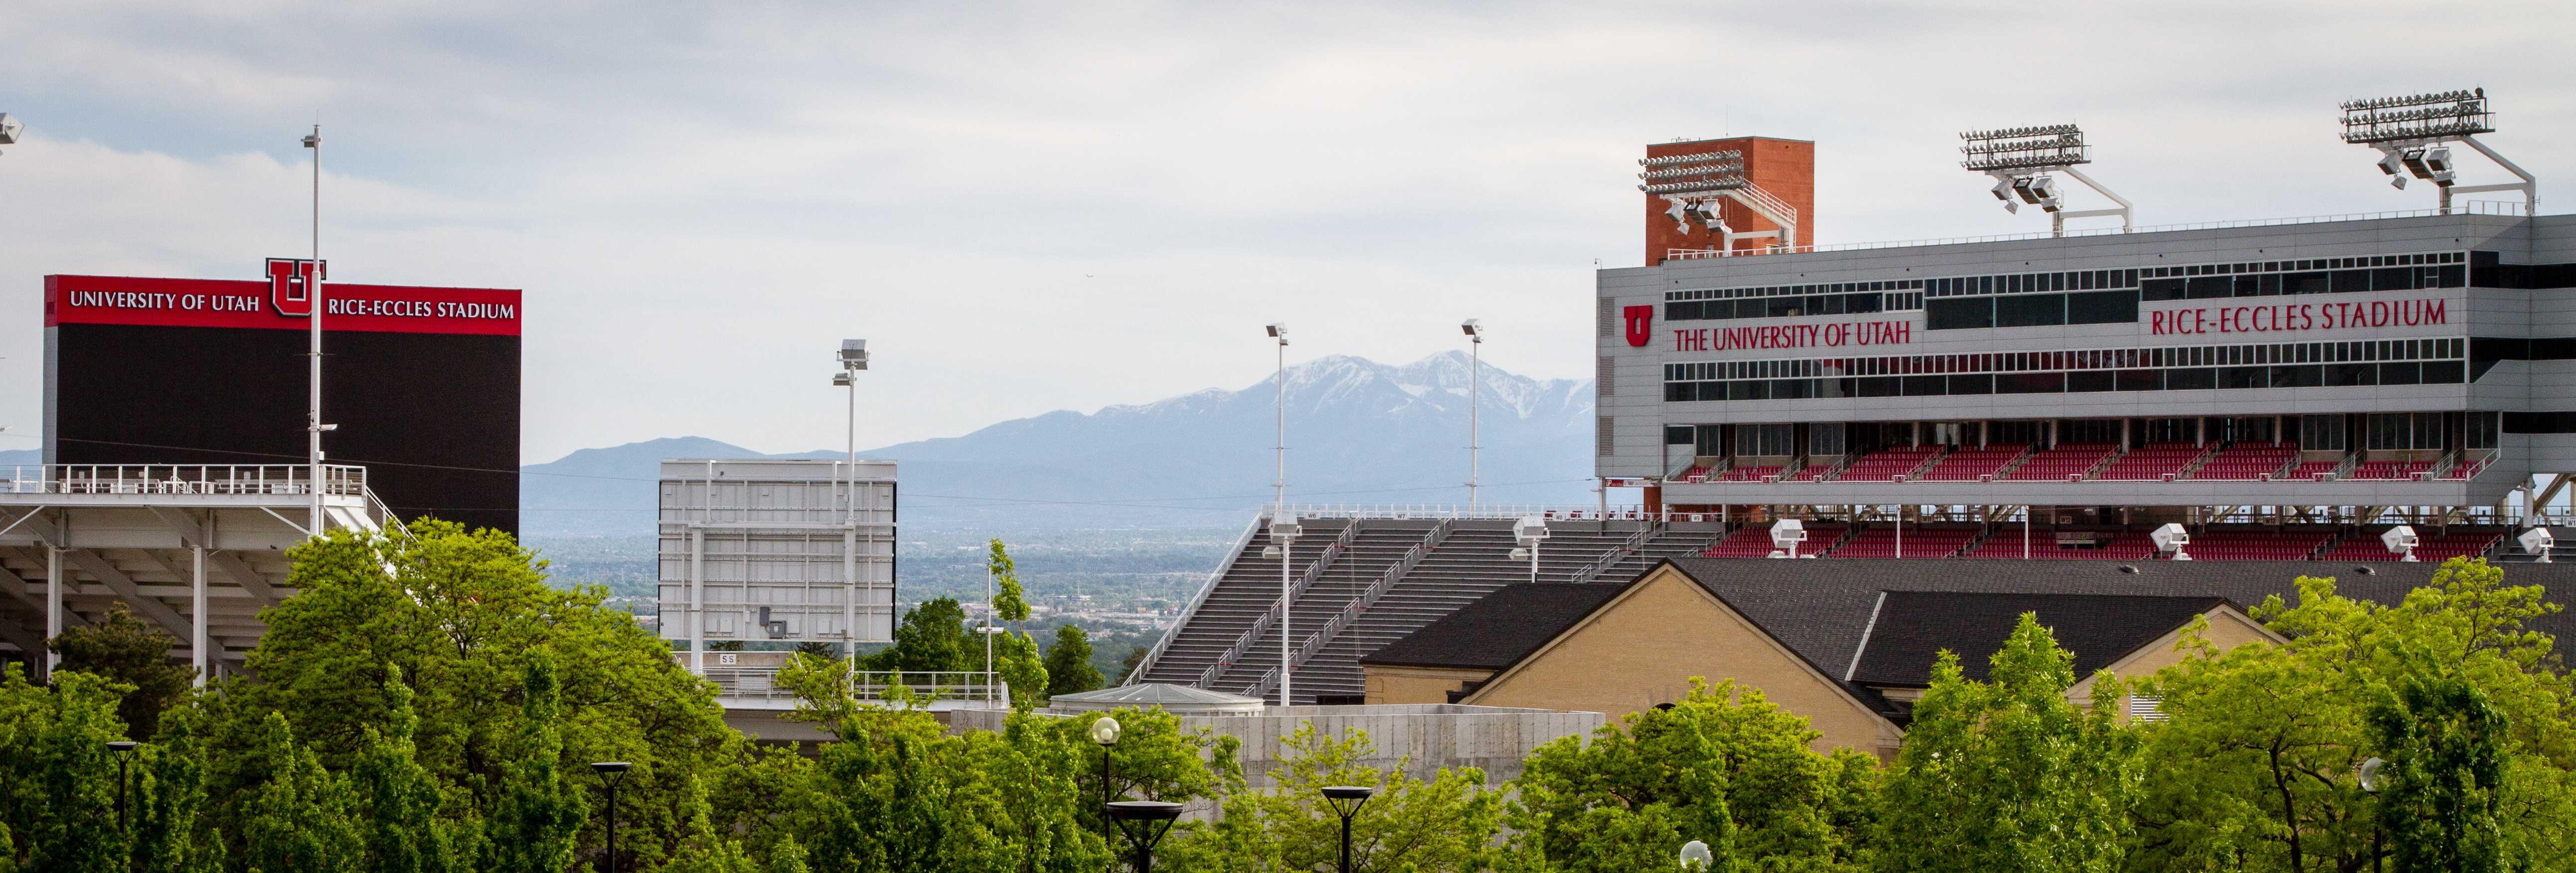 Rice Eccles Stadium at the University of Utah, Salt Lake City, UT 5/14/17.  (Photo by Adam Fondren | The Daily Utah Chronicle)